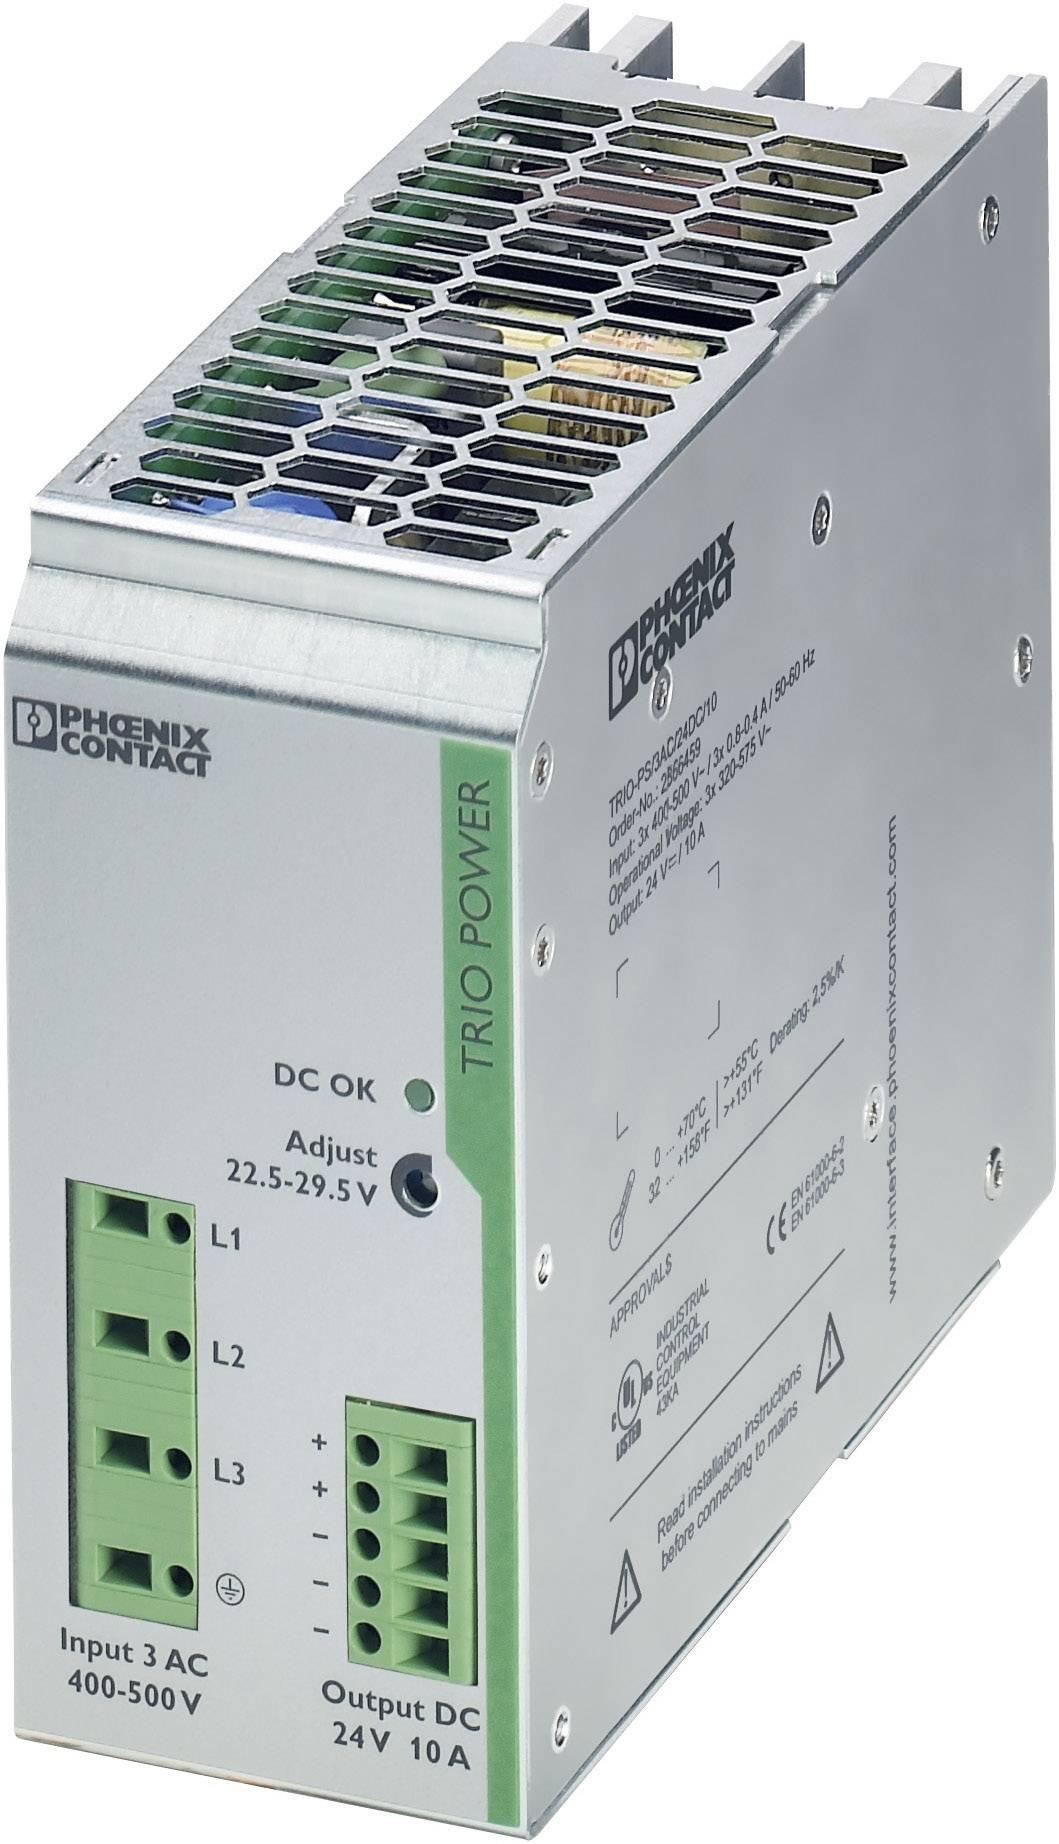 Sieťový zdroj na montážnu lištu (DIN lištu) Phoenix Contact TRIO-PS/3AC/24DC/10, 1 x, 24 V/DC, 10 A, 240 W